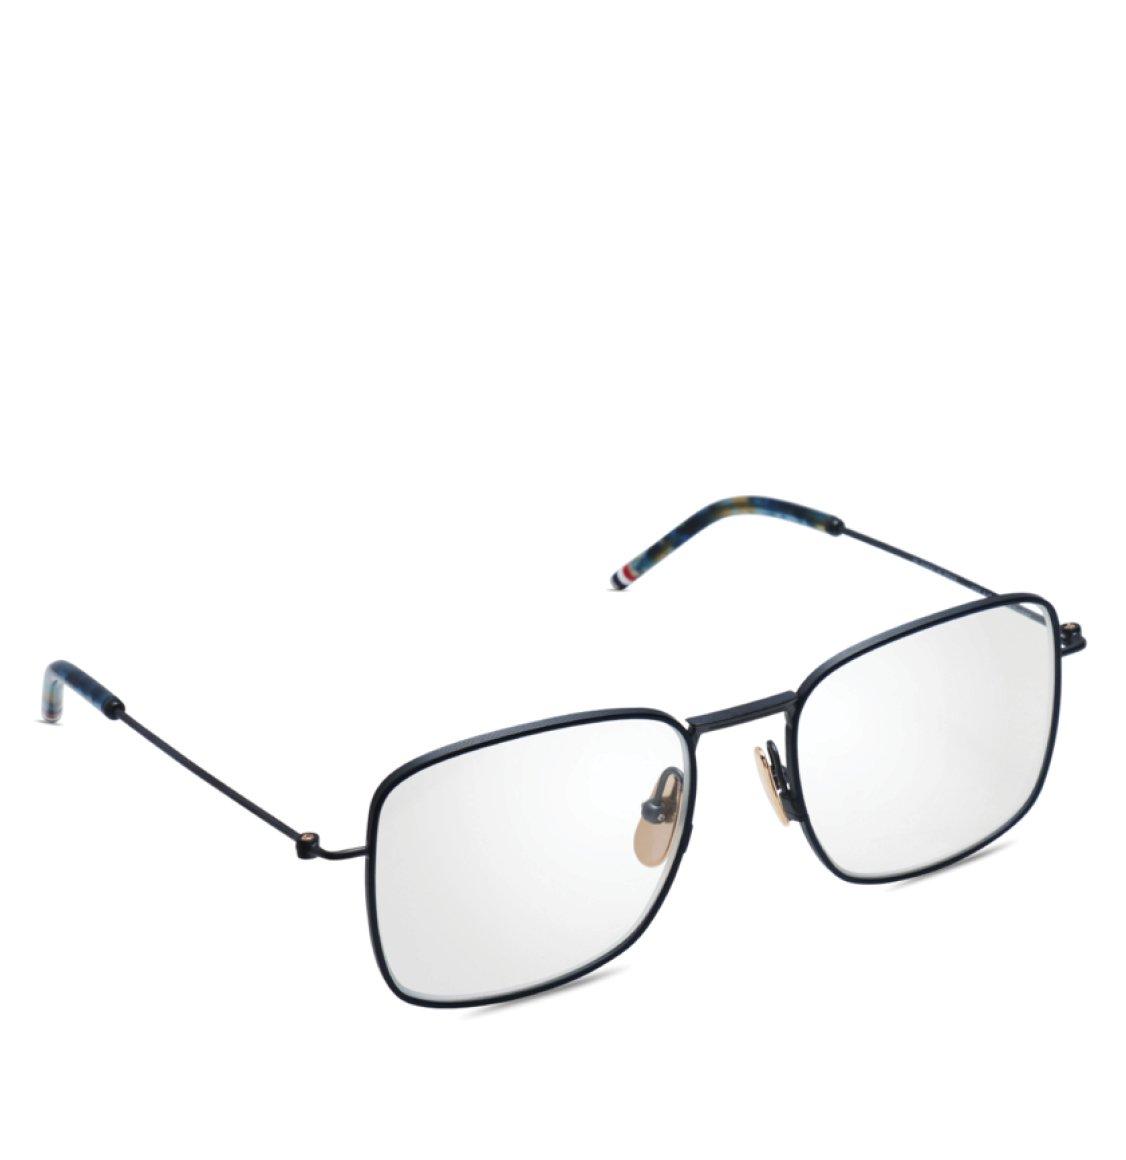 Thom Browne Black Iron And Navy Square-Frame Optical Glasses Γυαλιά Οράσεως